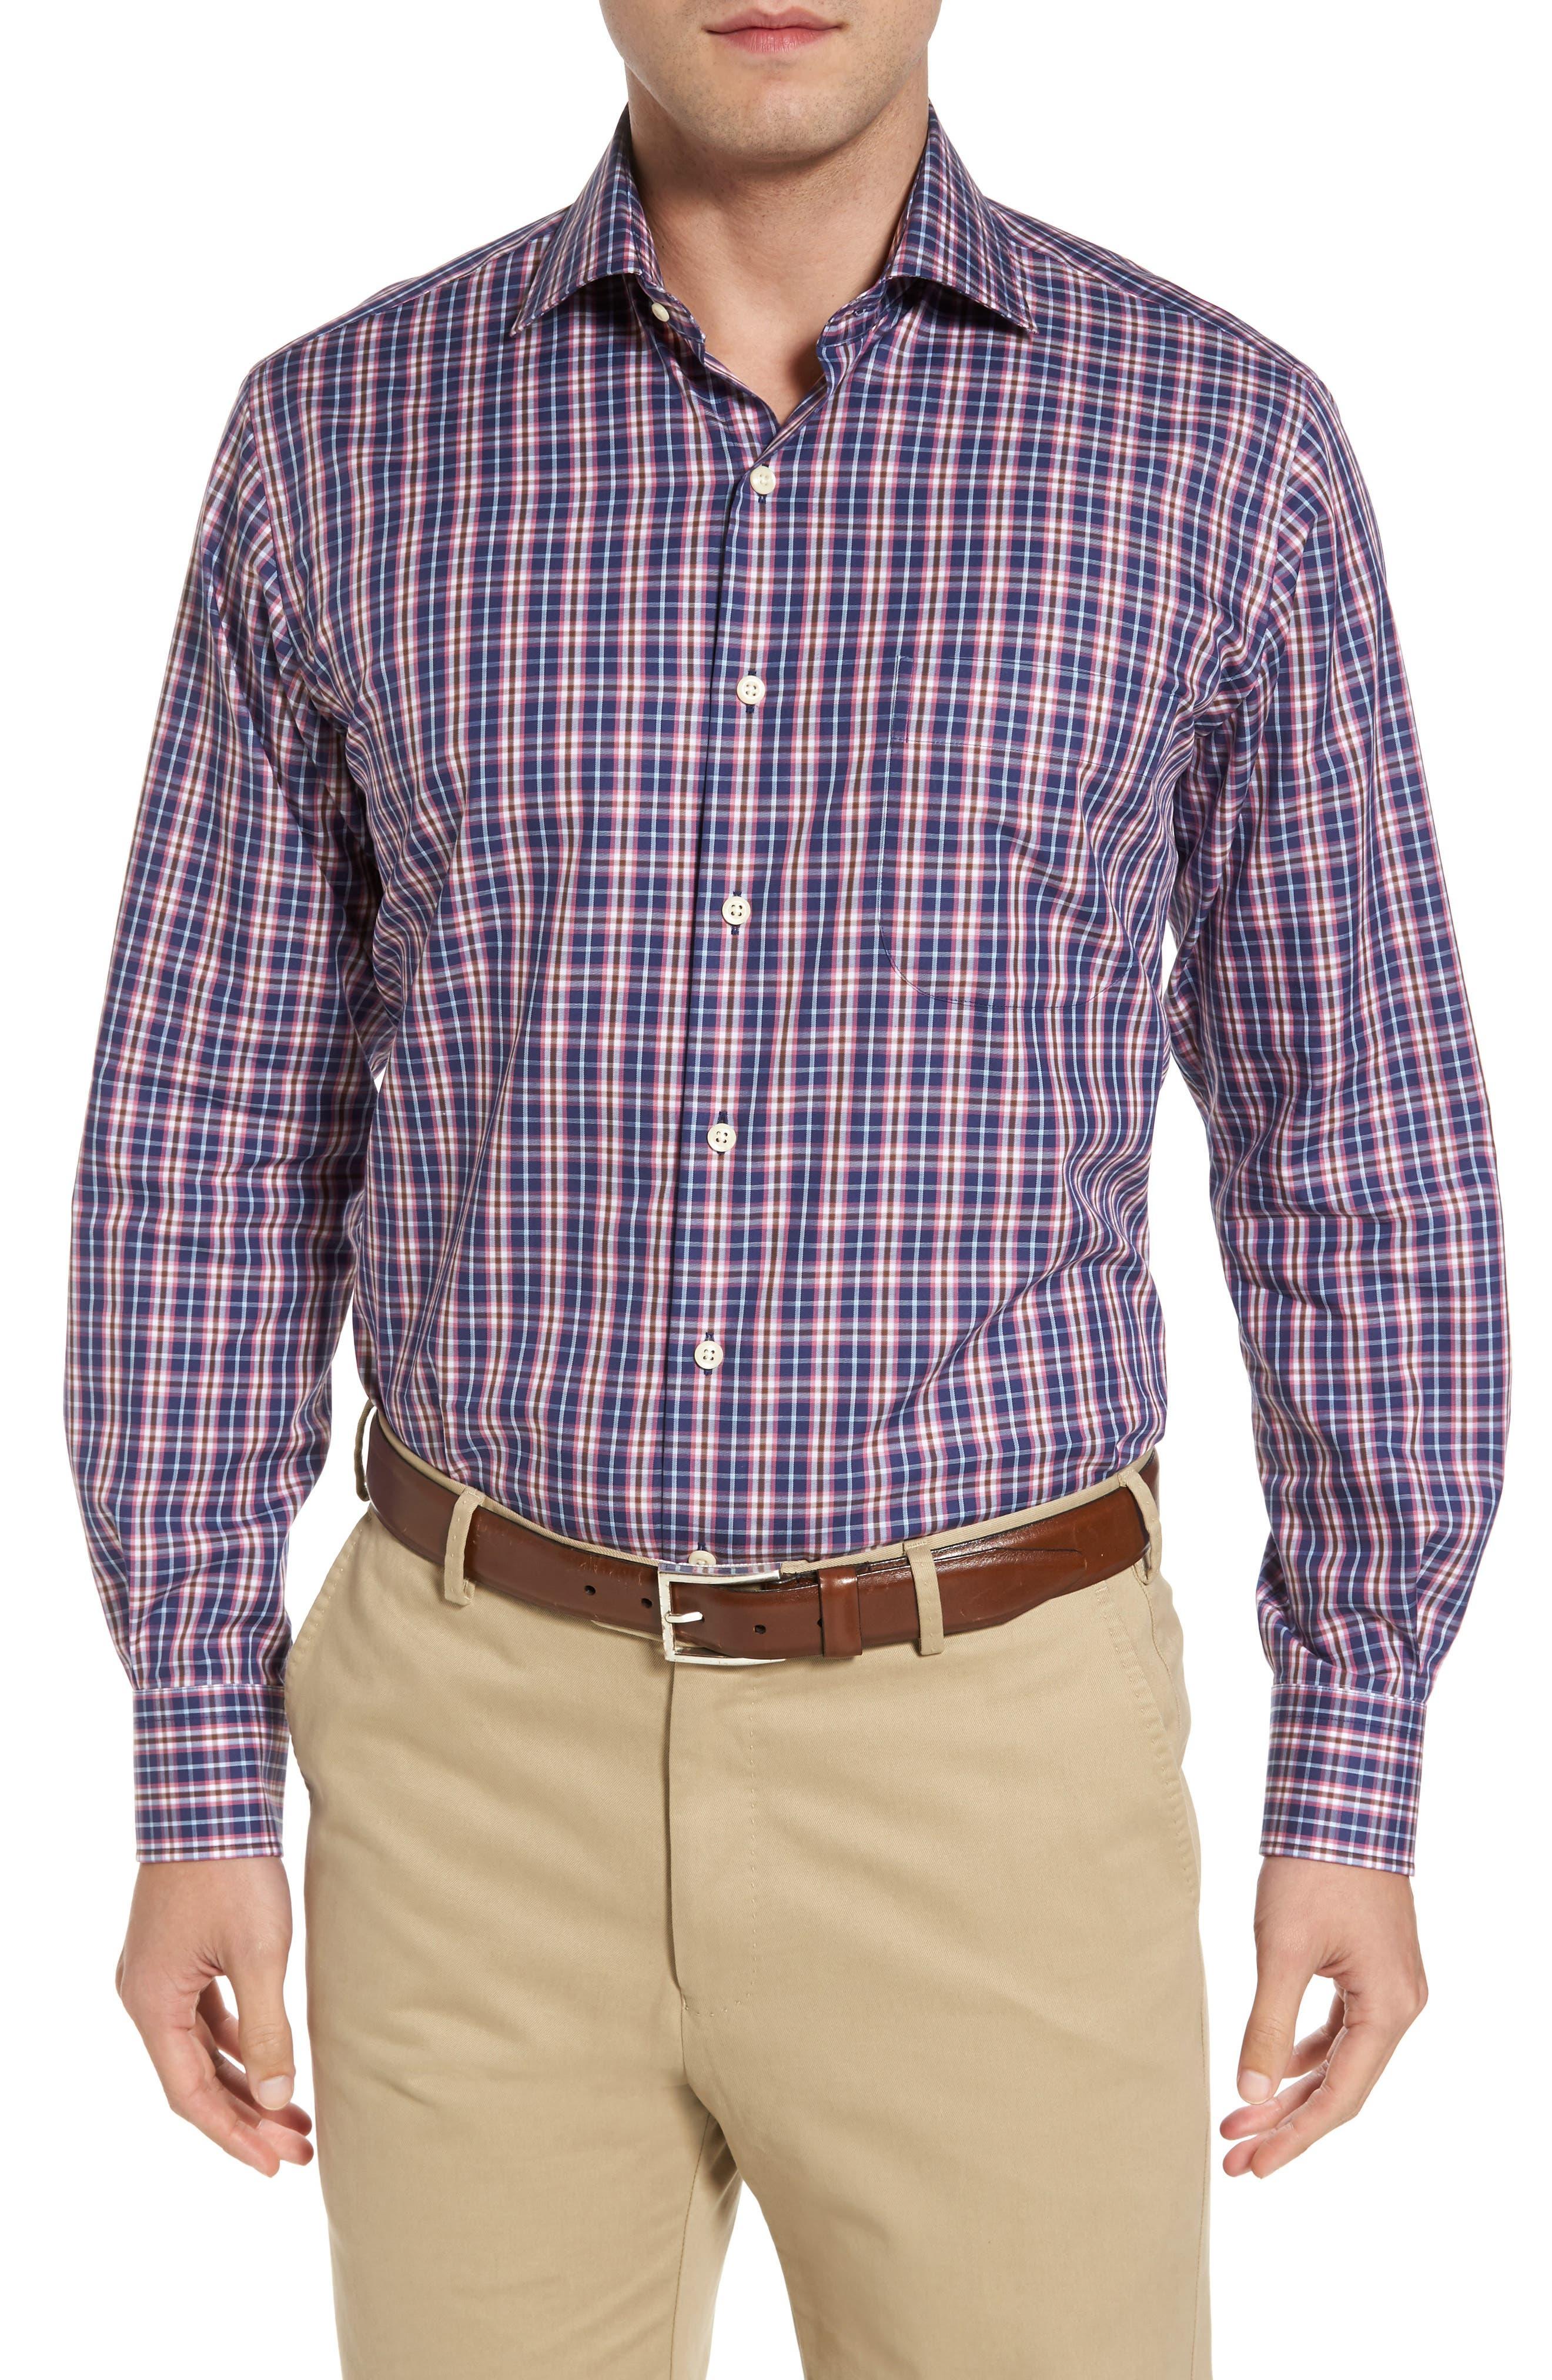 Mitchell Plaid Sport Shirt,                             Main thumbnail 1, color,                             420